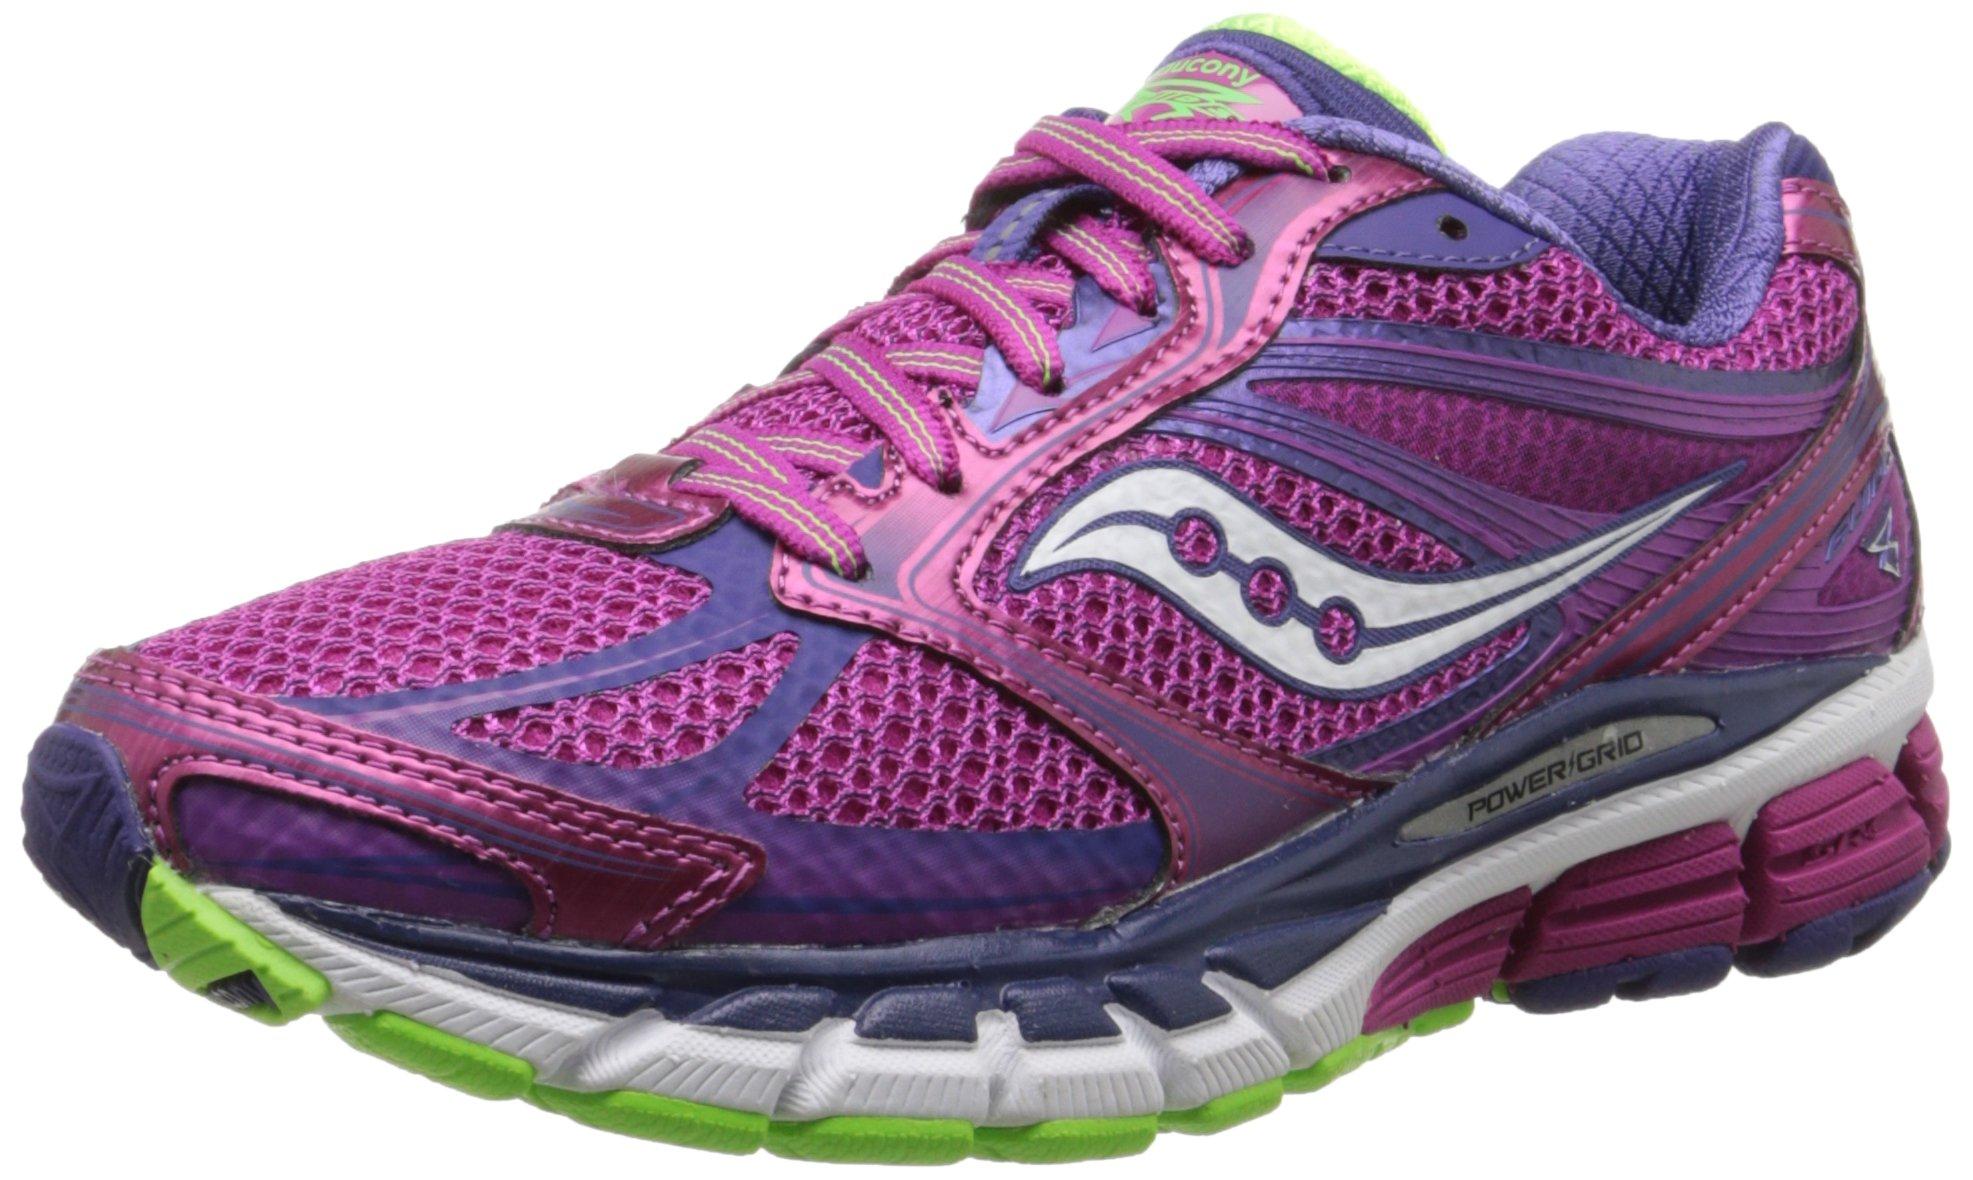 9e68e9d0b8be Galleon - Saucony Women s Guide 8 Road Running Shoe